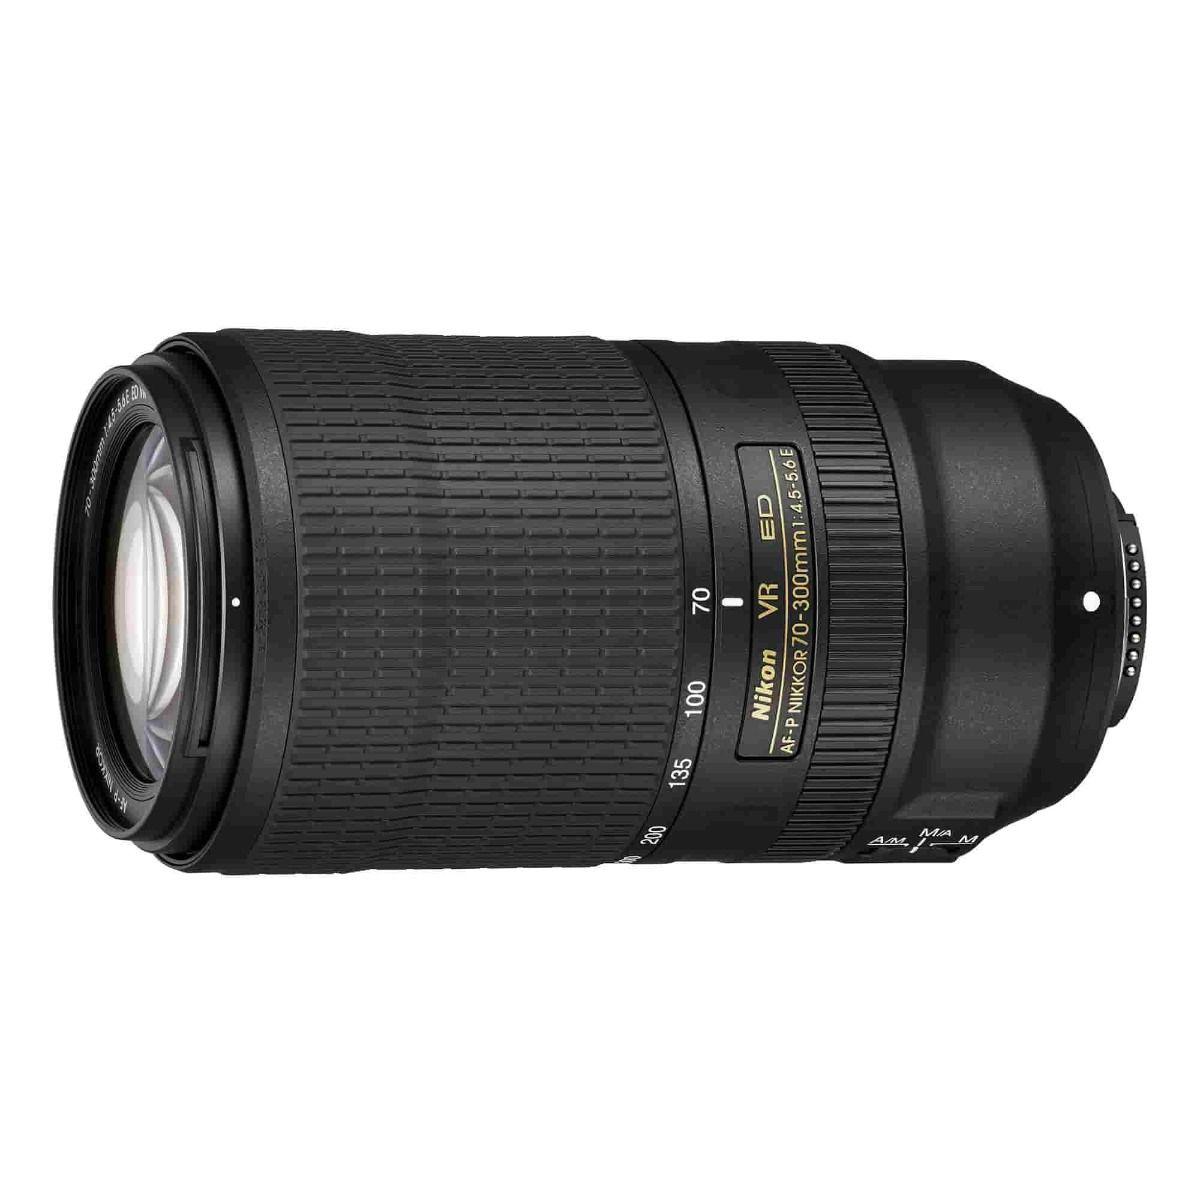 Nikon AF-P 70-300mm f/4.5-5.6E ED VR Lens,Nikon AF-P 70-300mm f/4.5-5.6E ED VR Lens,Nikon AF-P 70-300mm f/4.5-5.6E ED VR Lens